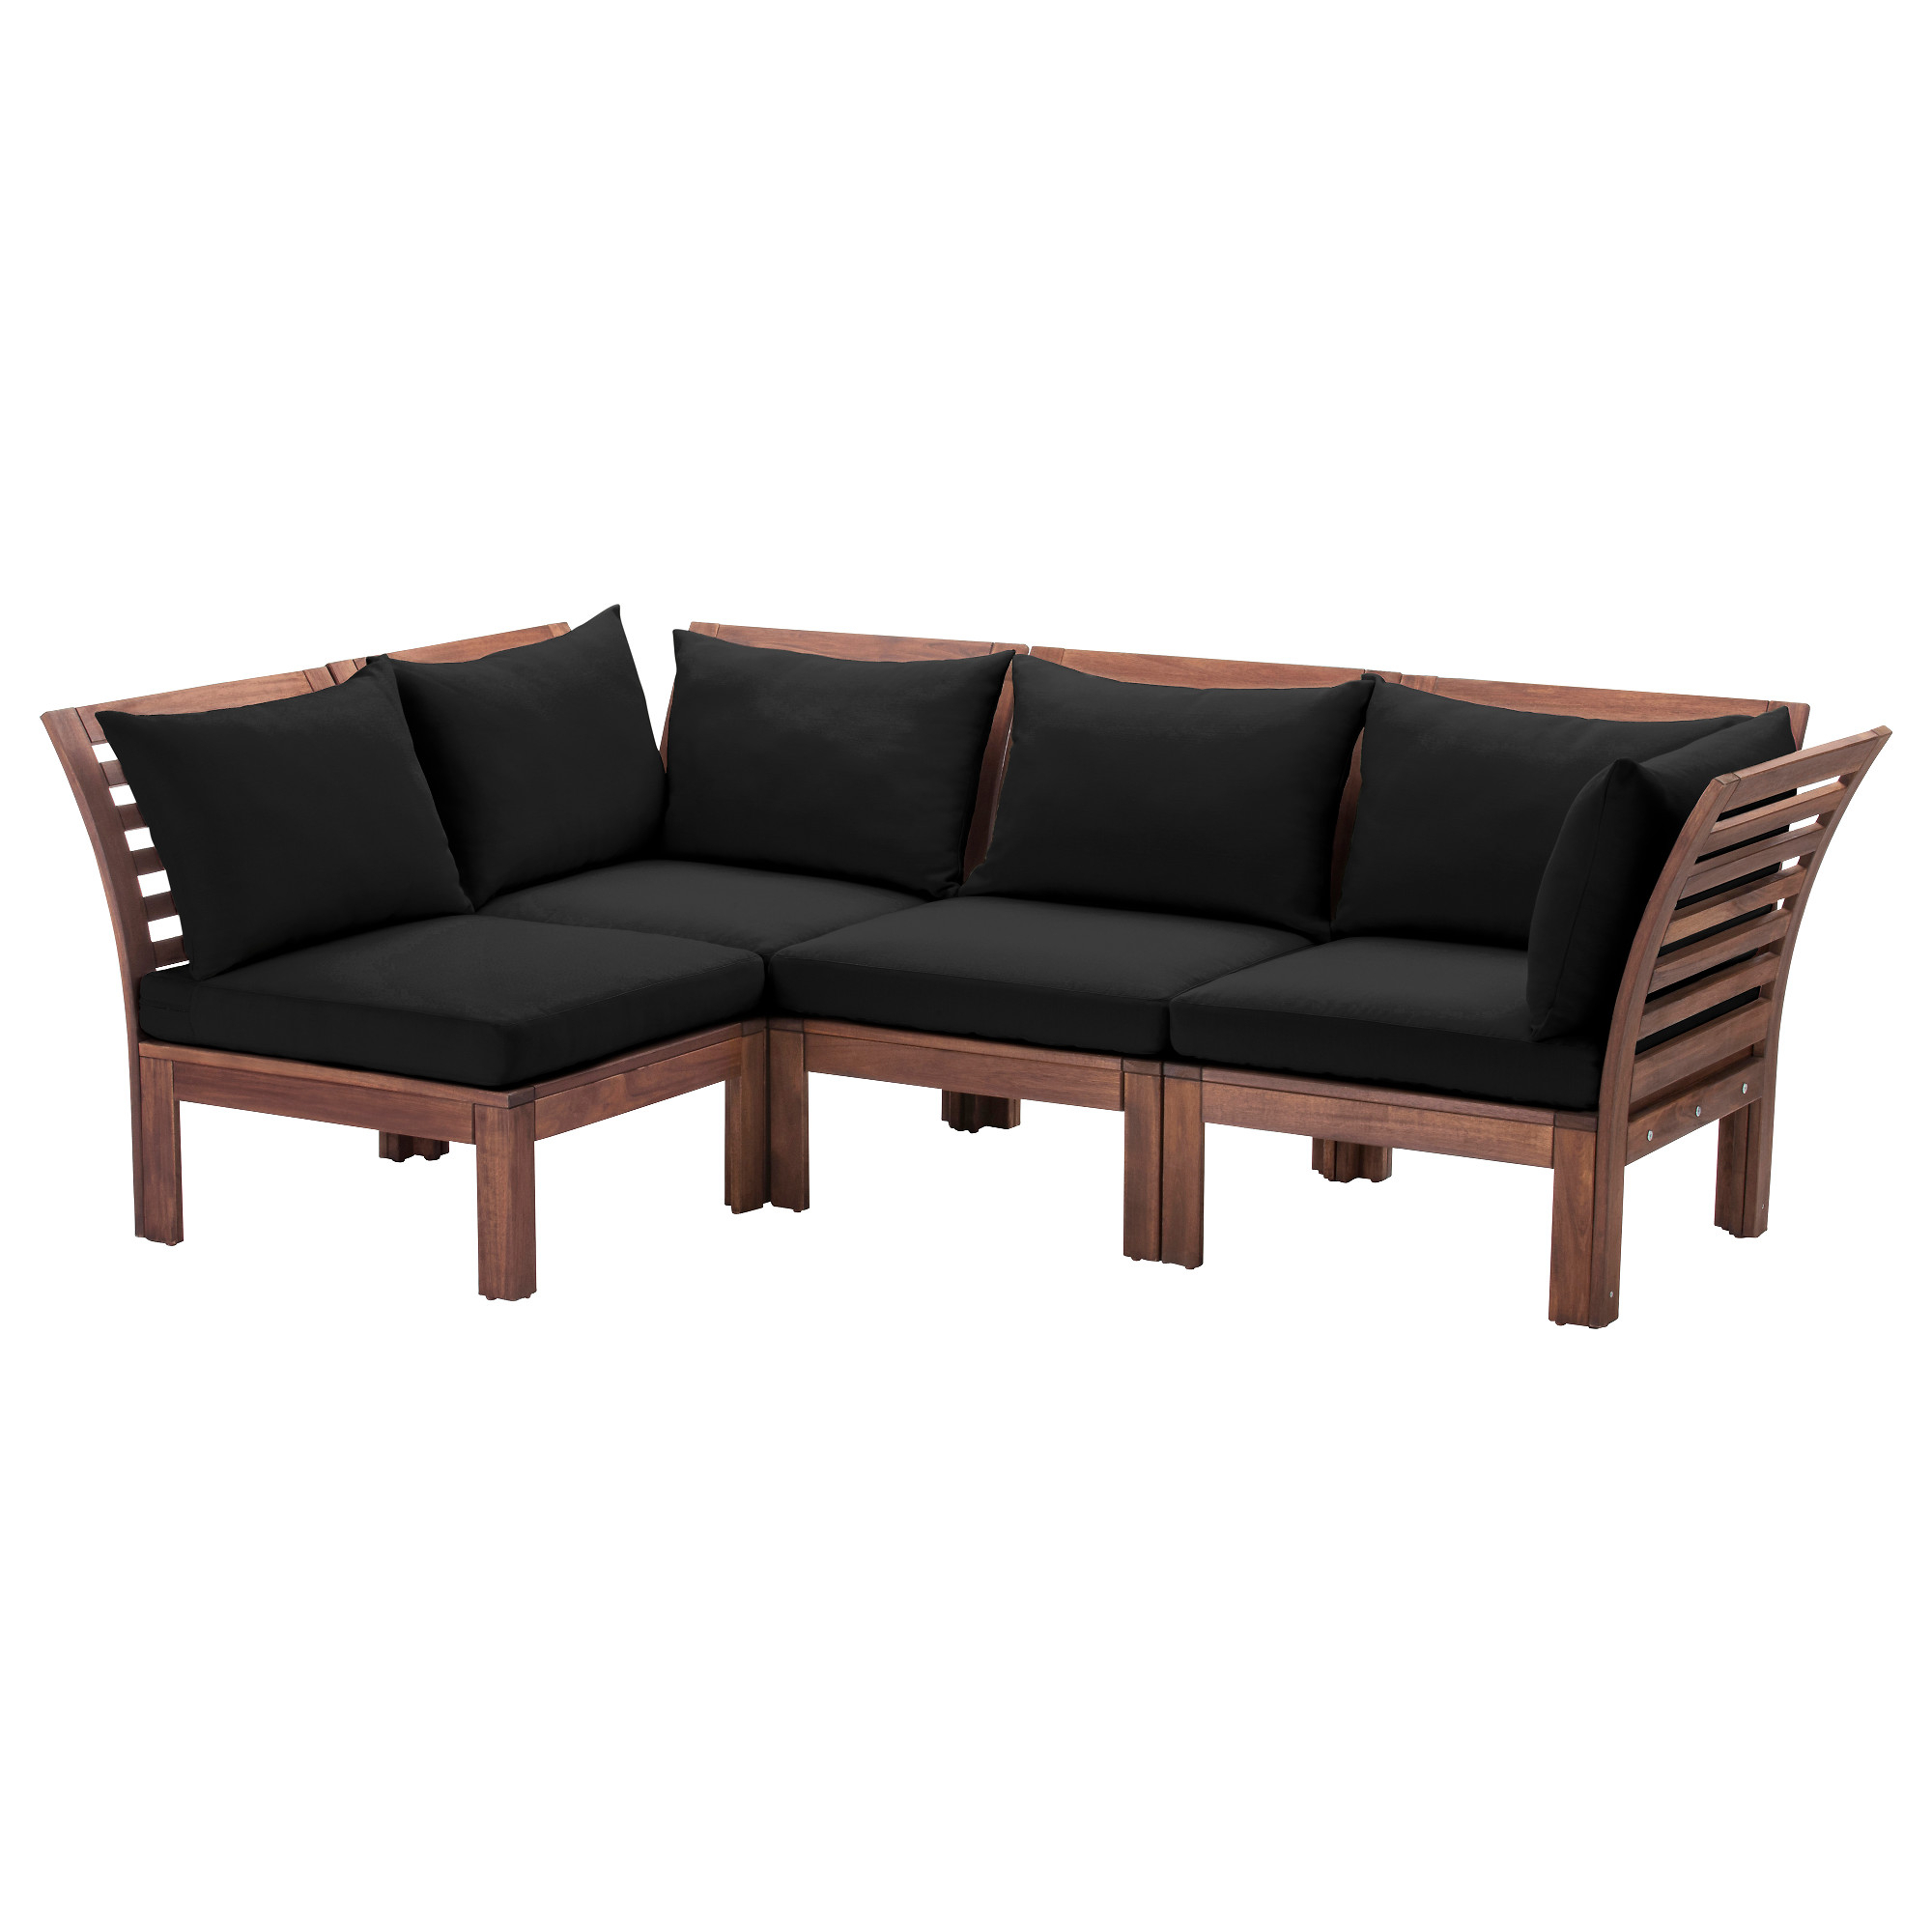 Äpplarö – Modular Corner Sofa 3 Seat, Outdoor, Brown Intended For Modular Corner Sofas (View 1 of 15)